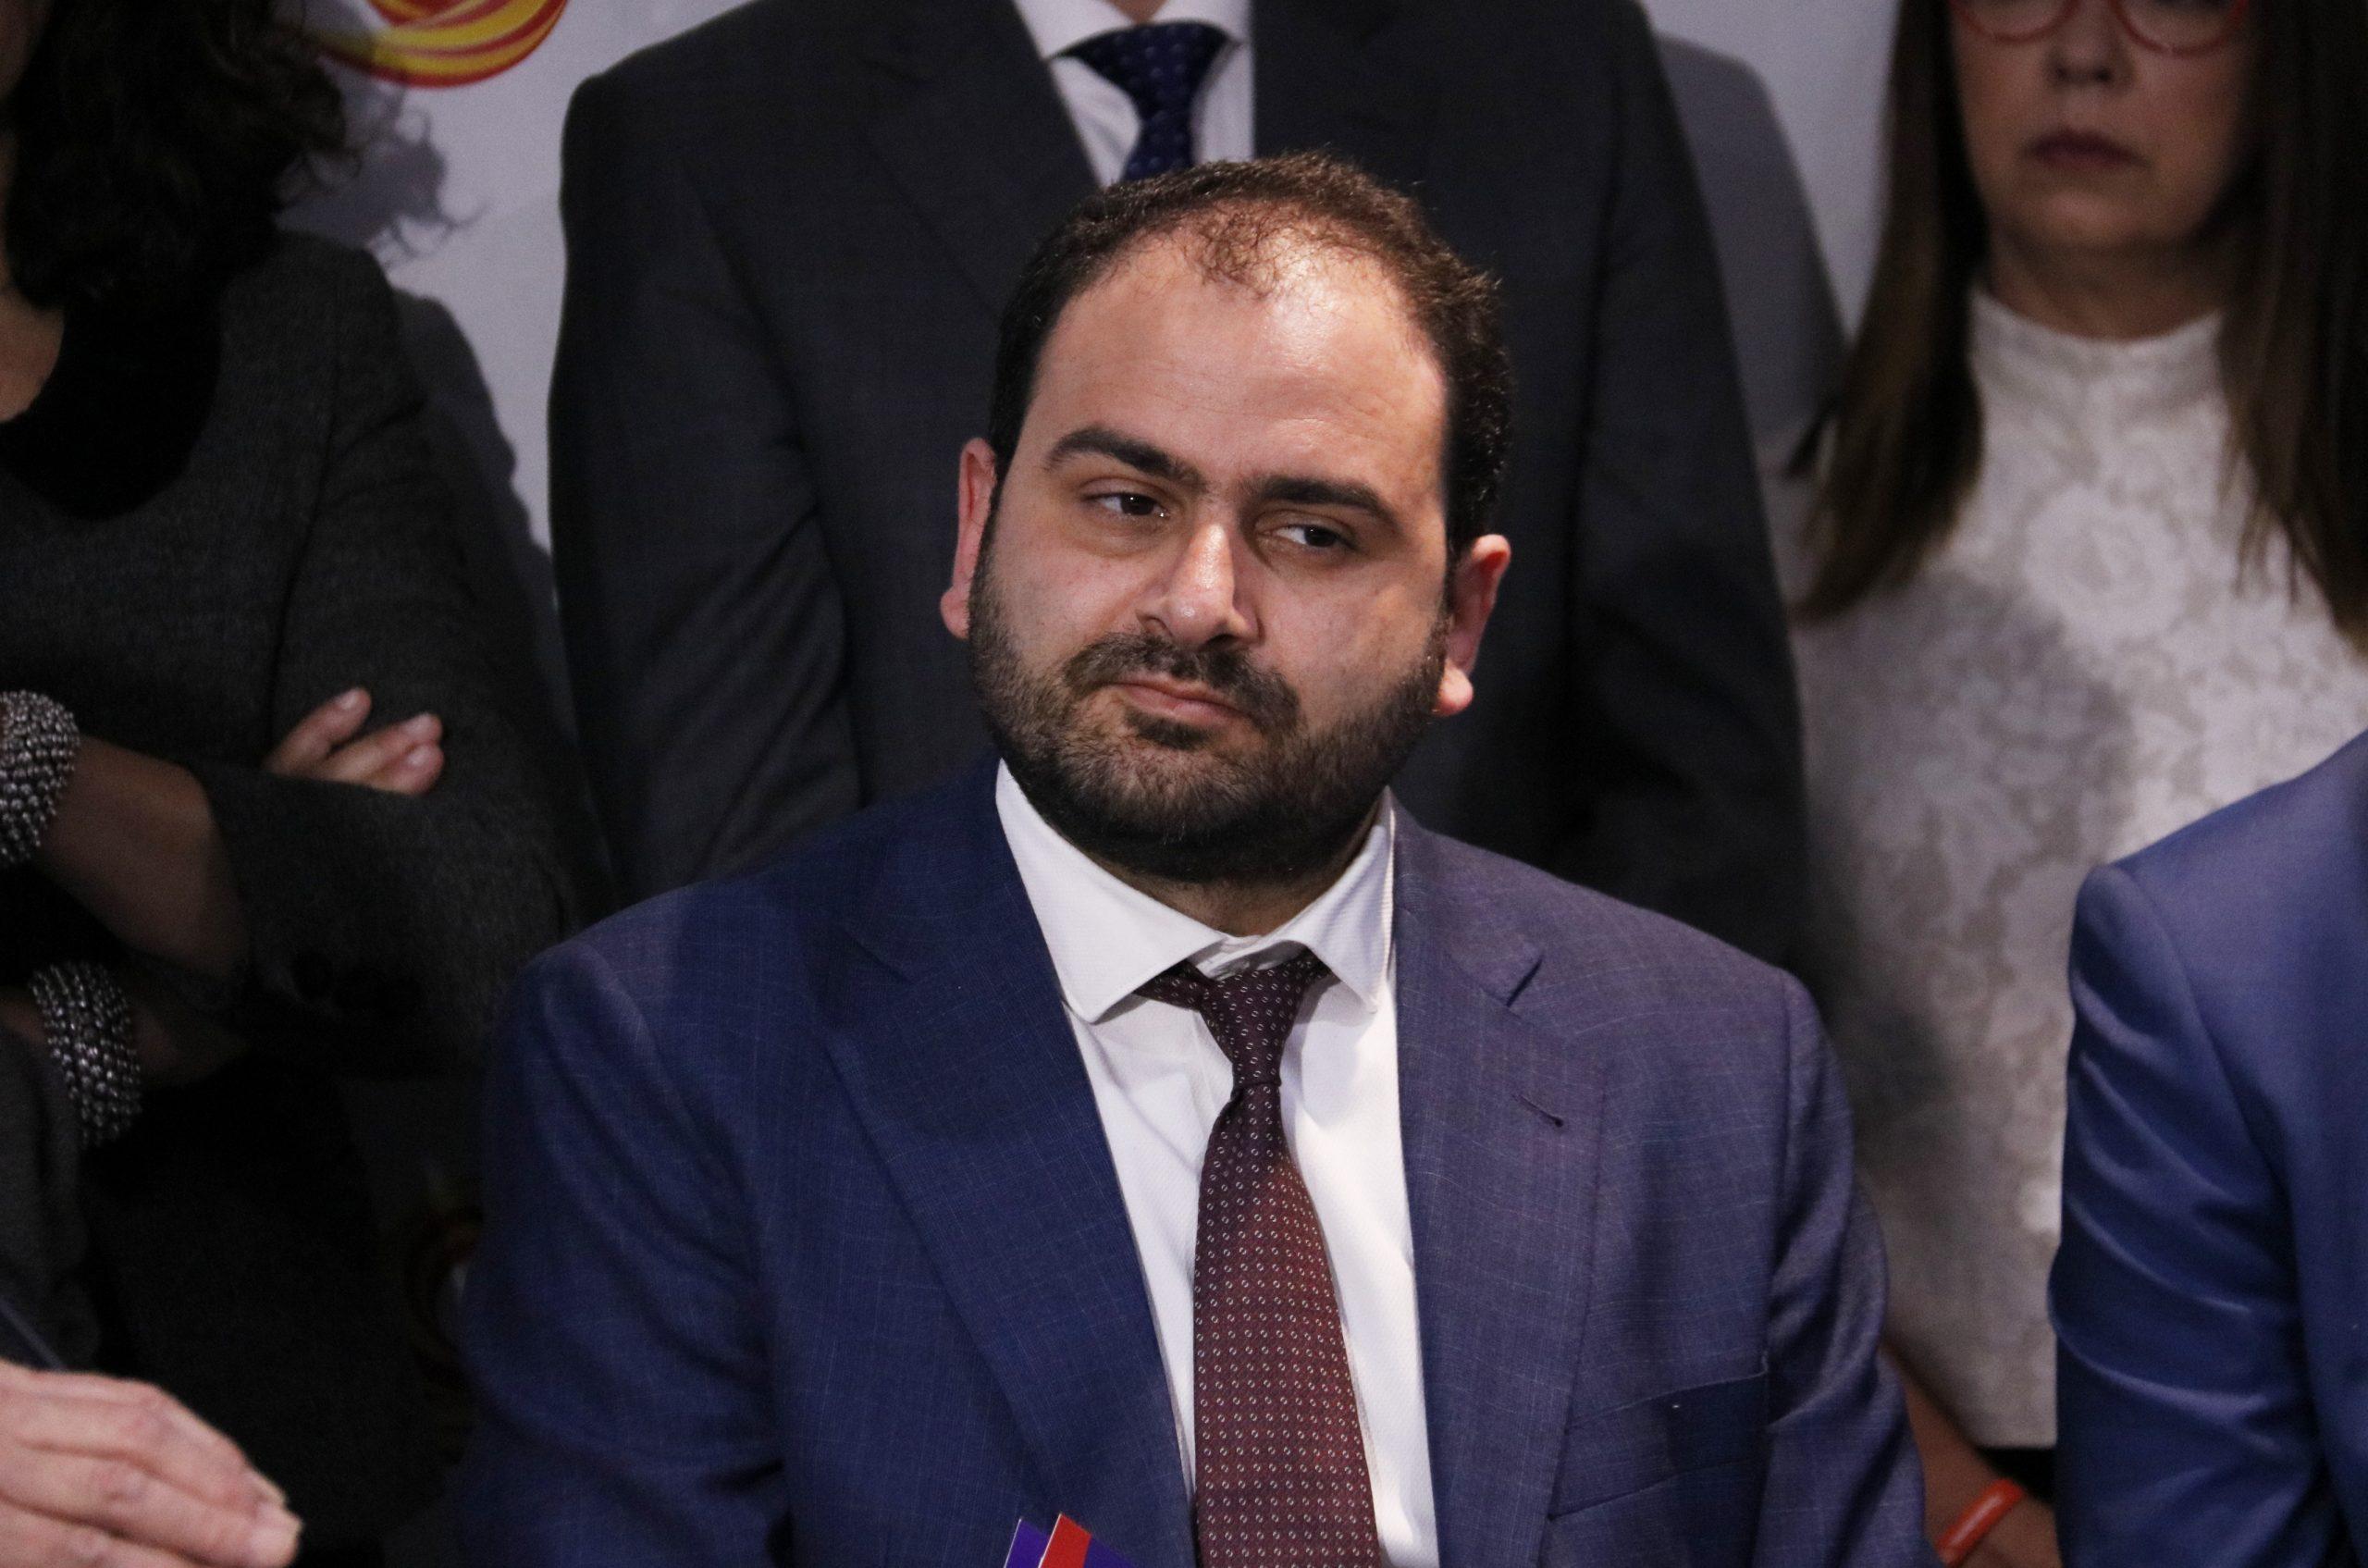 El president de Societat Civil Catalana, Fernando Sánchez Costa | ACN